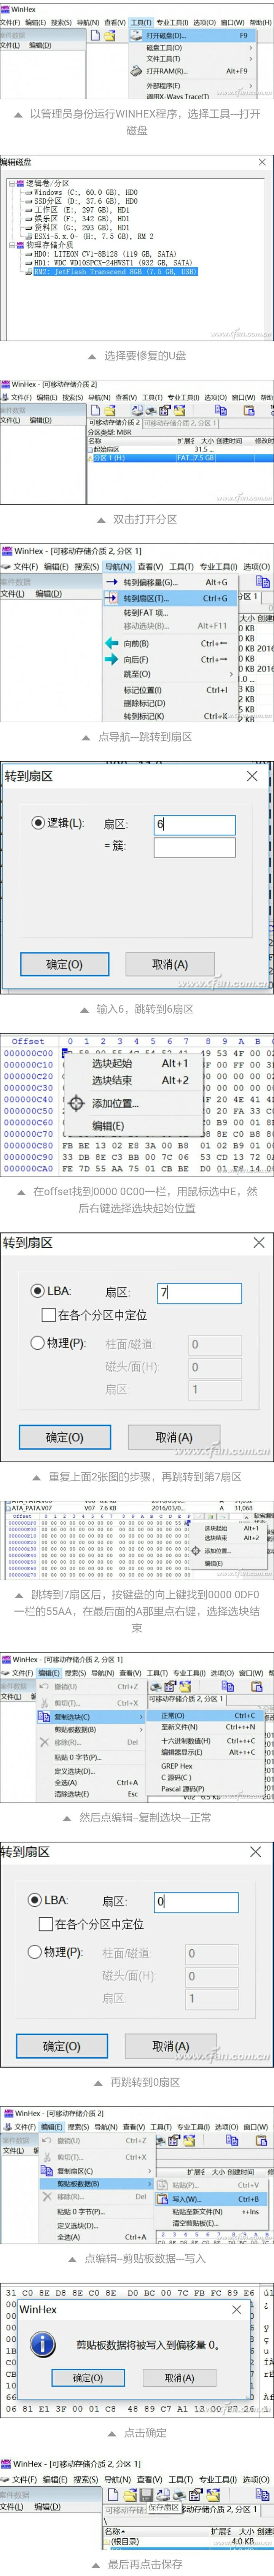 U盘提示格式化 解决的三种绝技